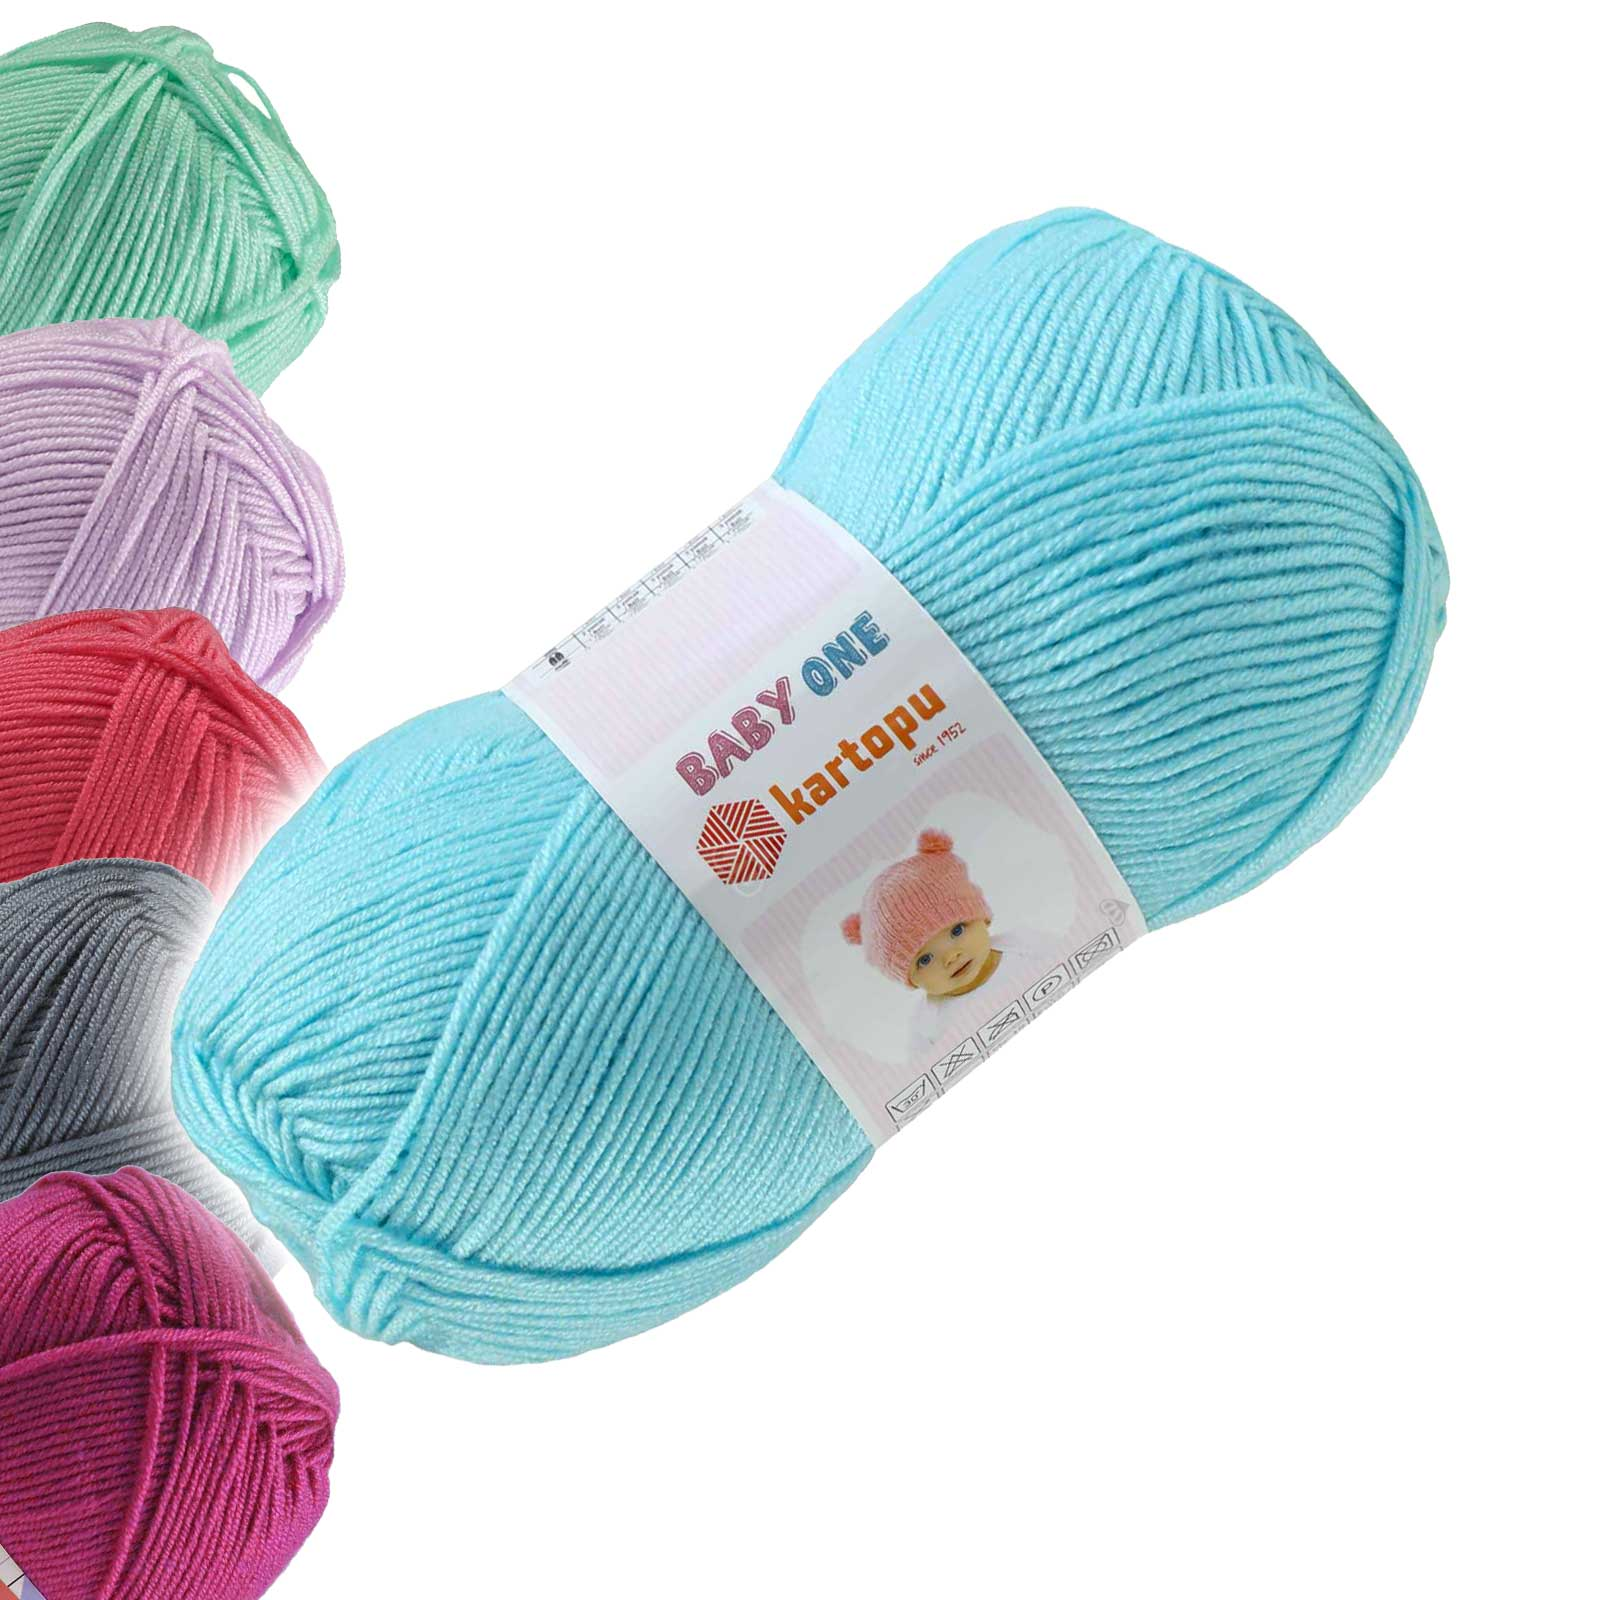 100g Strickgarn Kartopu BABY ONE Antipilling Babywolle Babystrickgarn, Farbwahl – Bild 24